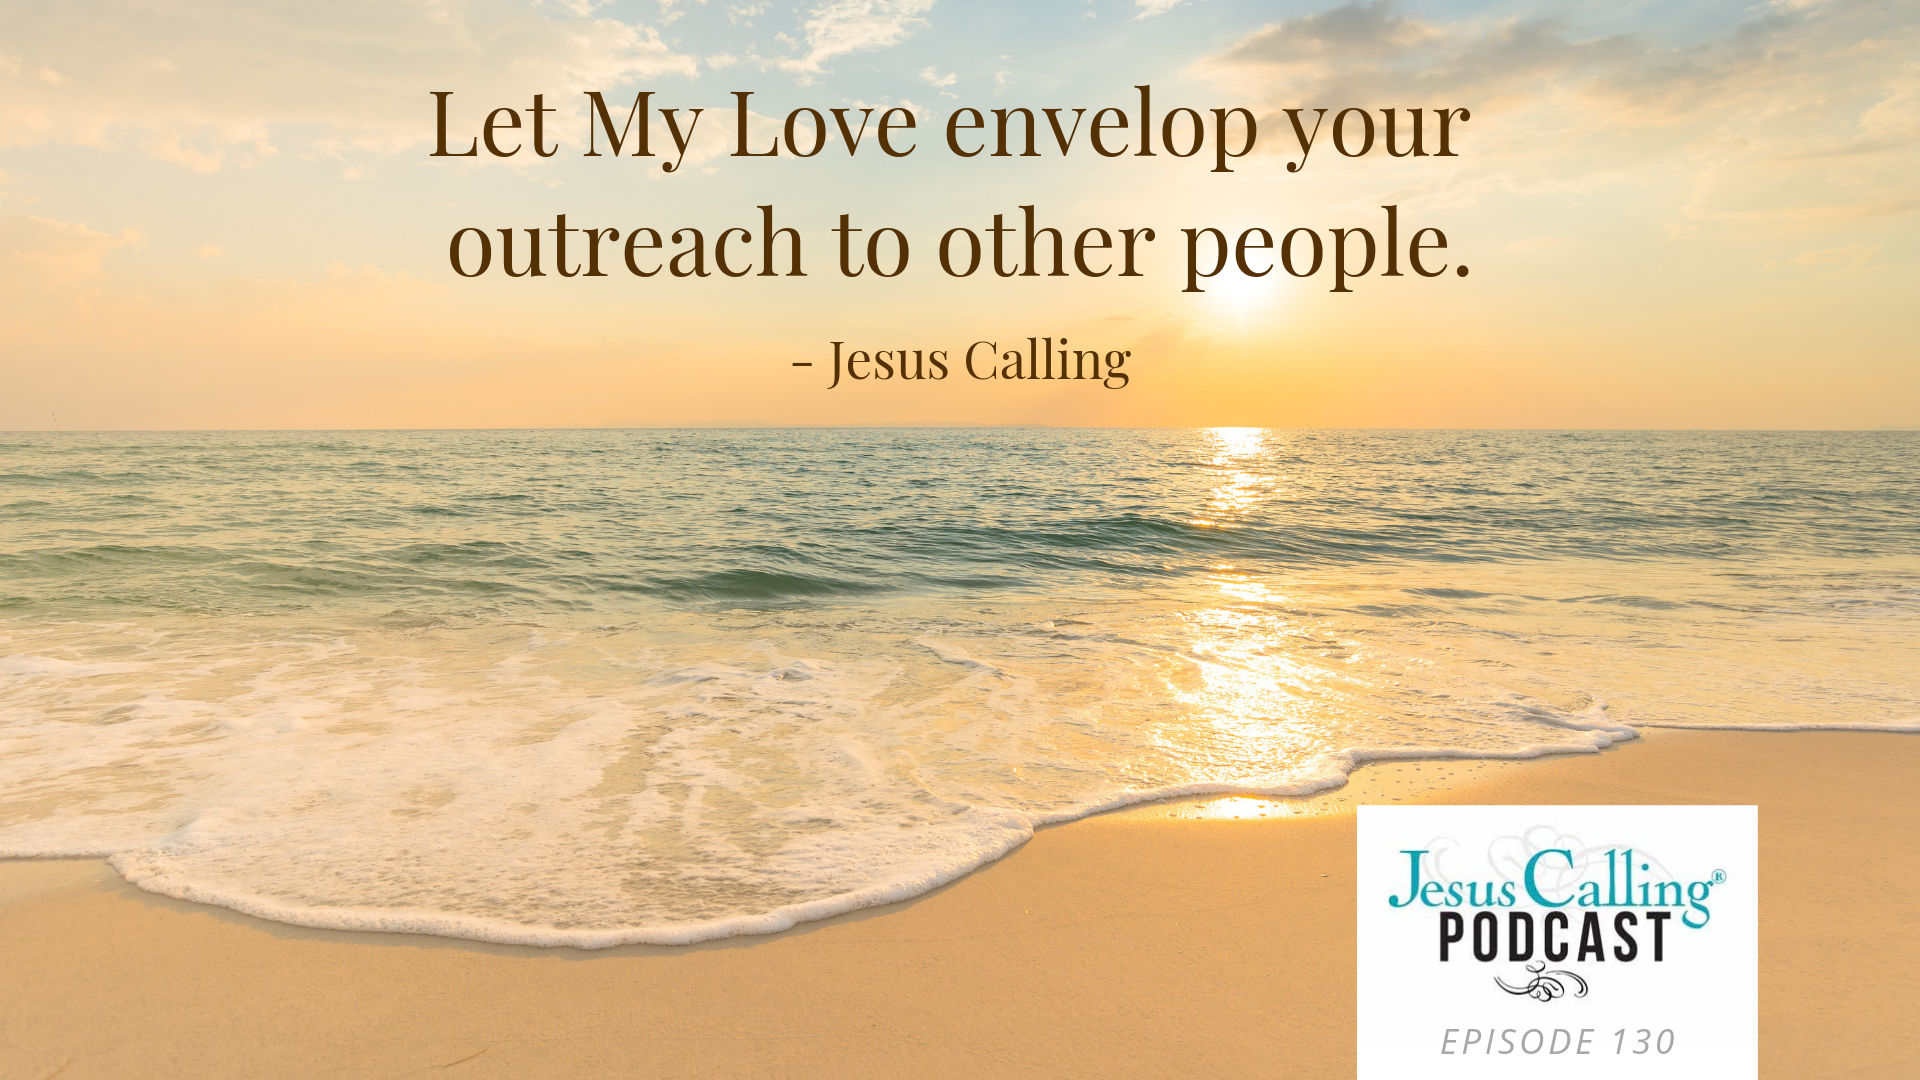 Jesus Calling podcast #130 featuring Bethany Hamilton & Switchfoot's Jon Foreman